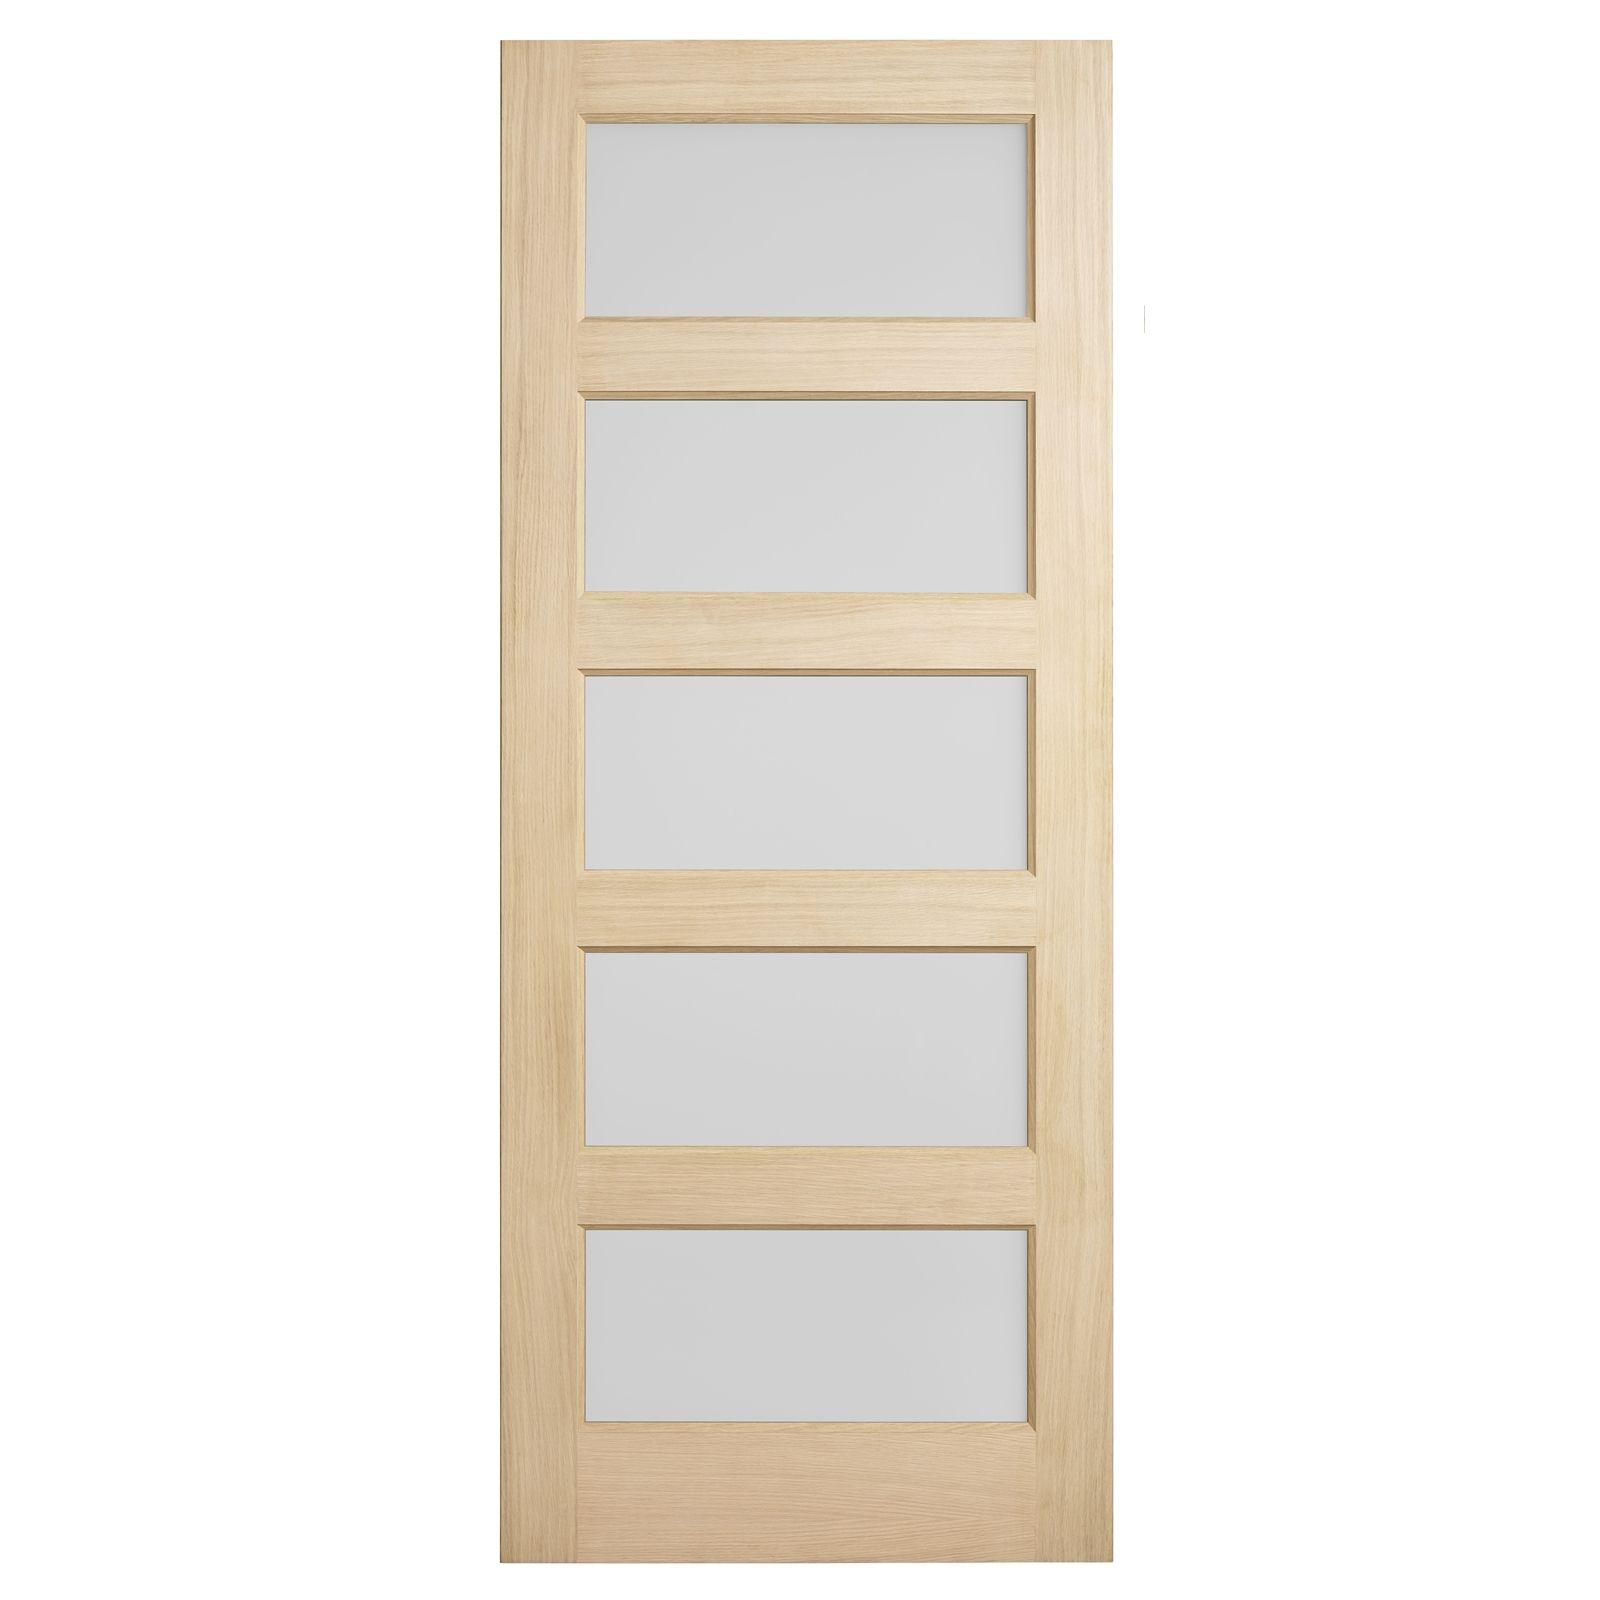 Maple Doors Bunnings Woodcraft Doors 2040 X 820 X 35mm One Lite Frosted Laminated Glass Internal Door Sc 1 Th 225